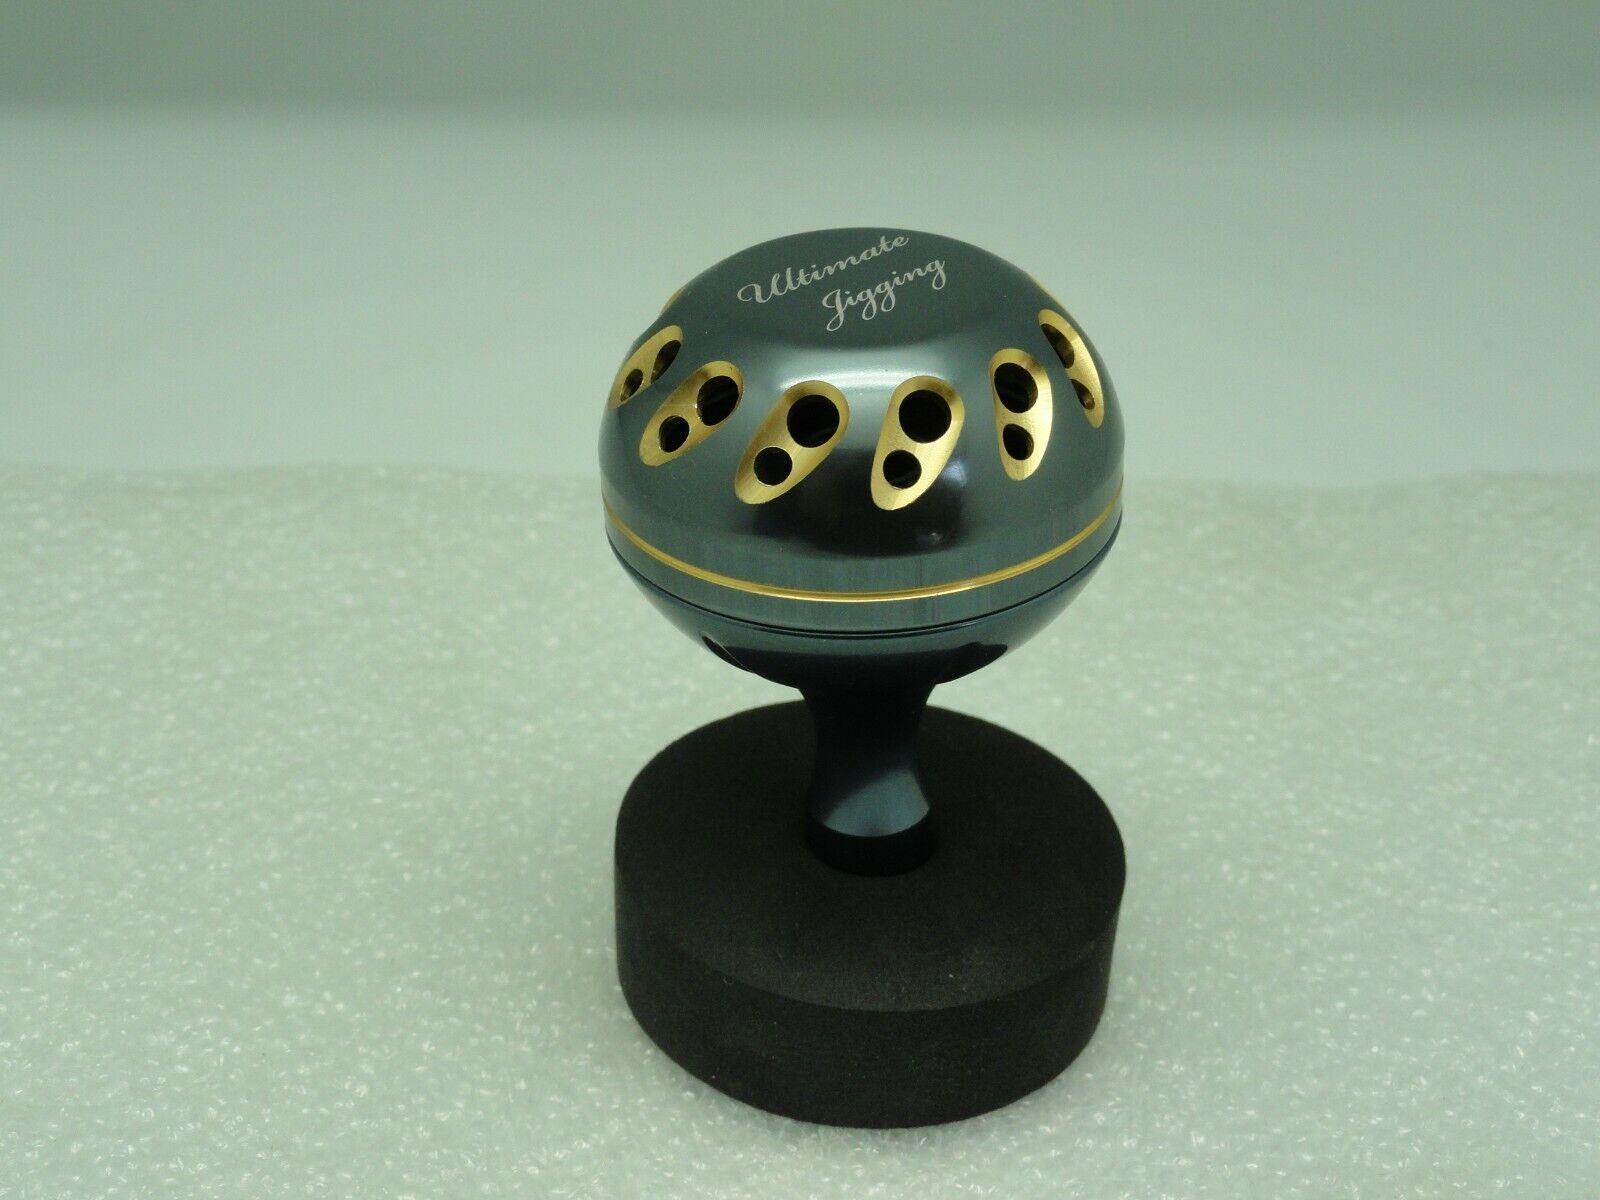 UJ PRK 45mm knob for Shimano Stella Twinpower Saragosa SW 500030000 reel GR GD